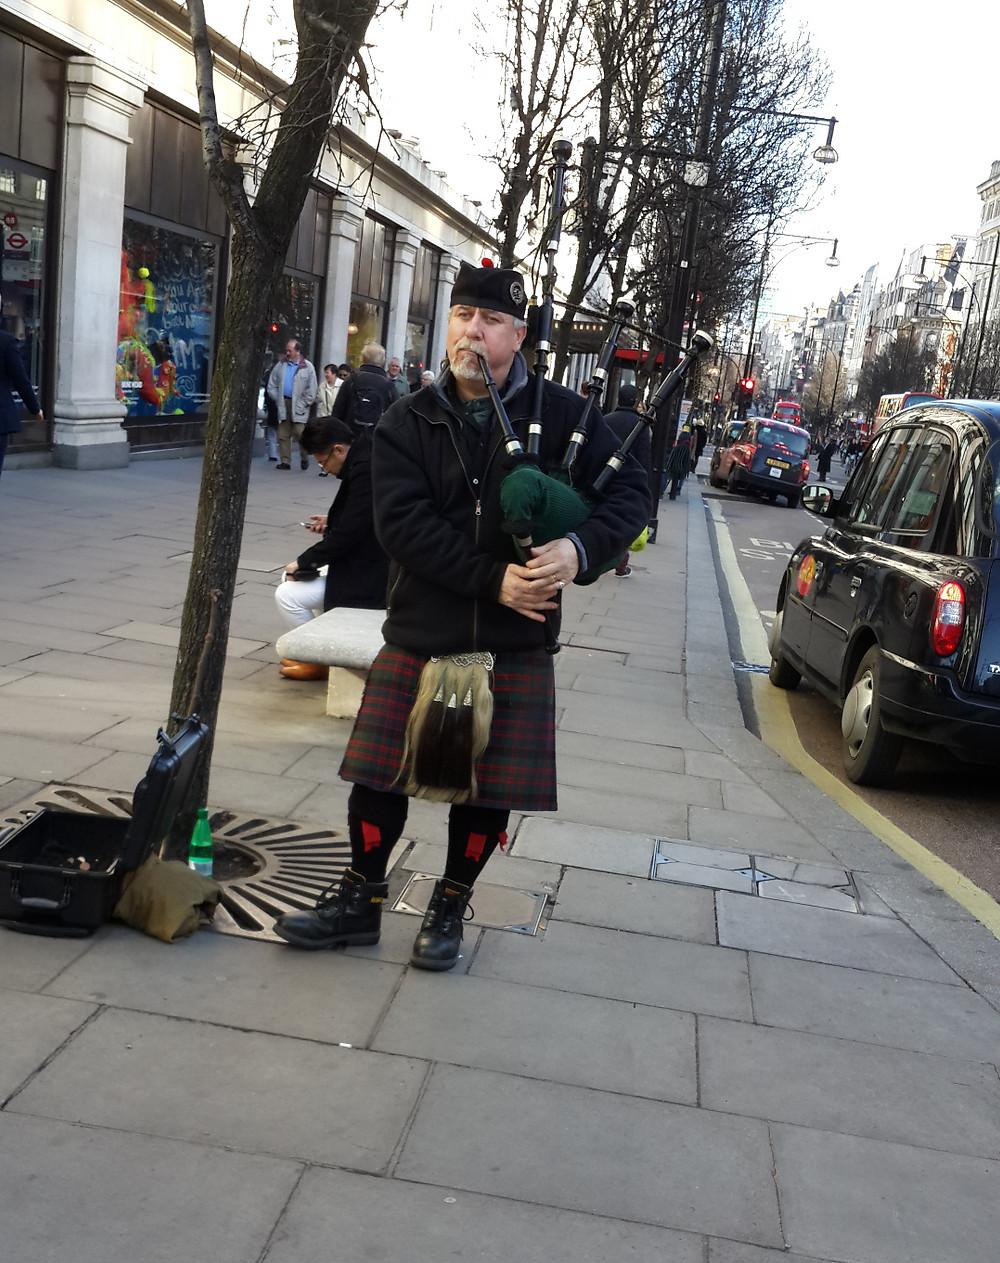 scottish man in London_edited.jpg